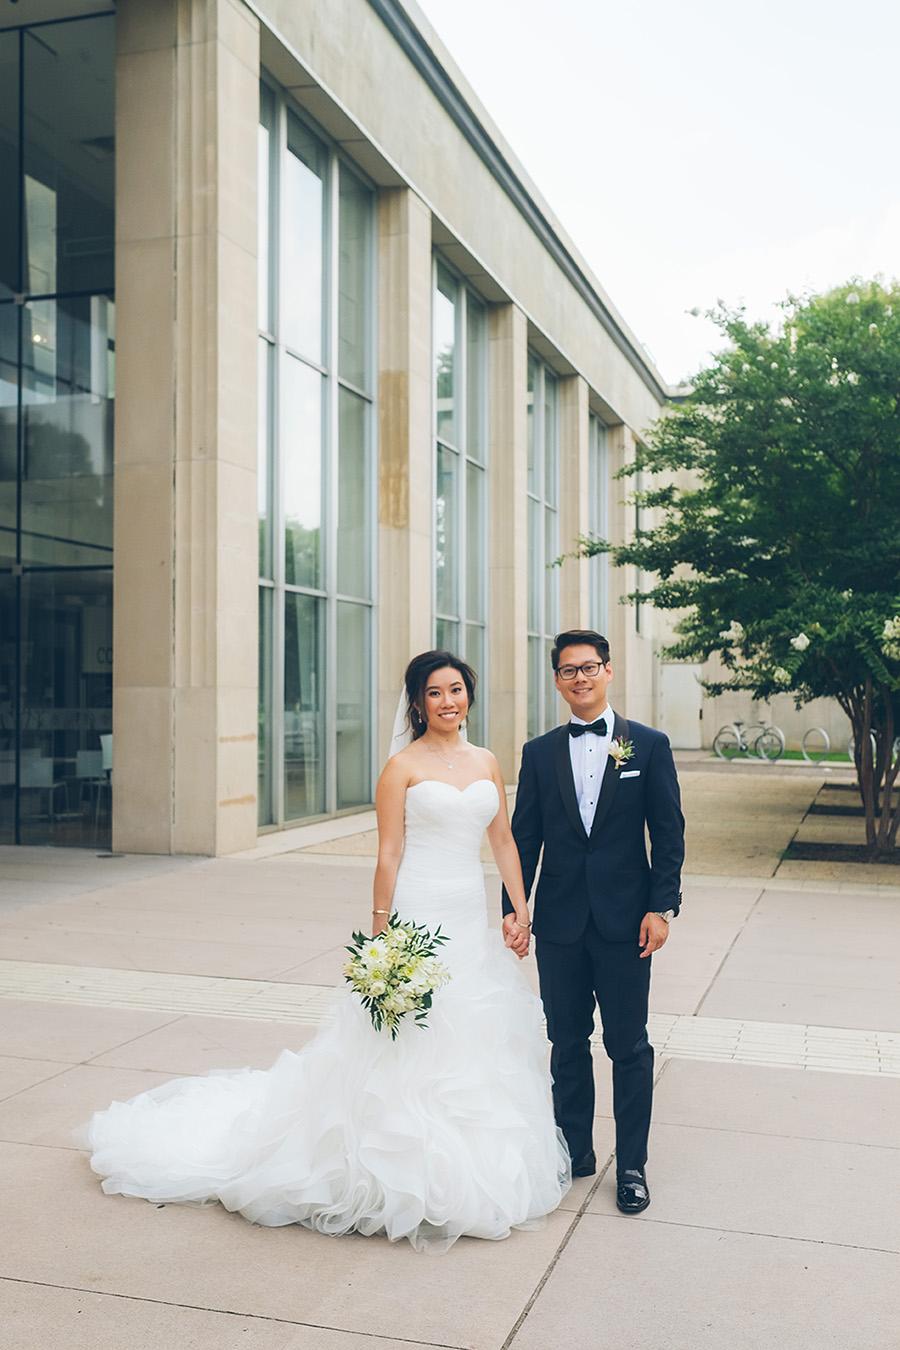 JUDITH-IRVING-NYC-WEDDING-BRIDEGROOM-CYNTHIACHUNG-0320.jpg